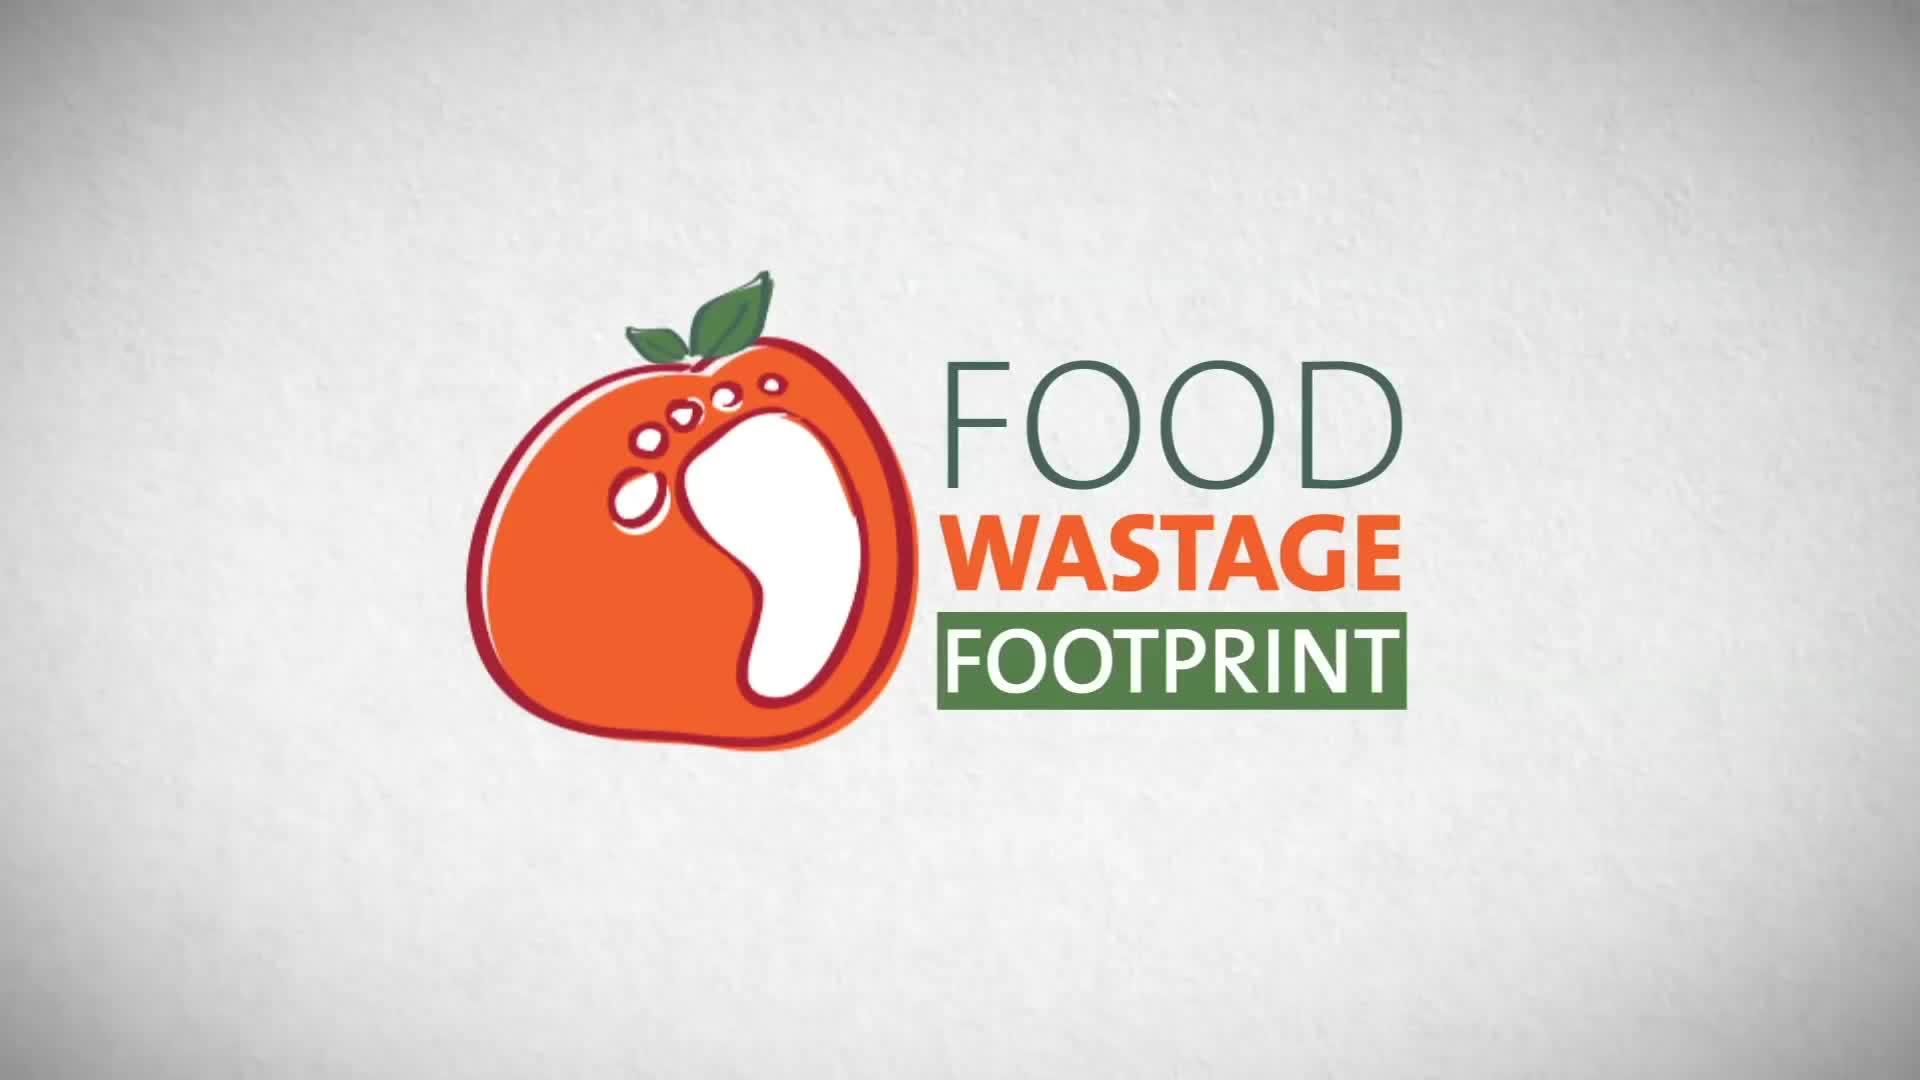 Food Wastage Footprint (B1-B2/v574)